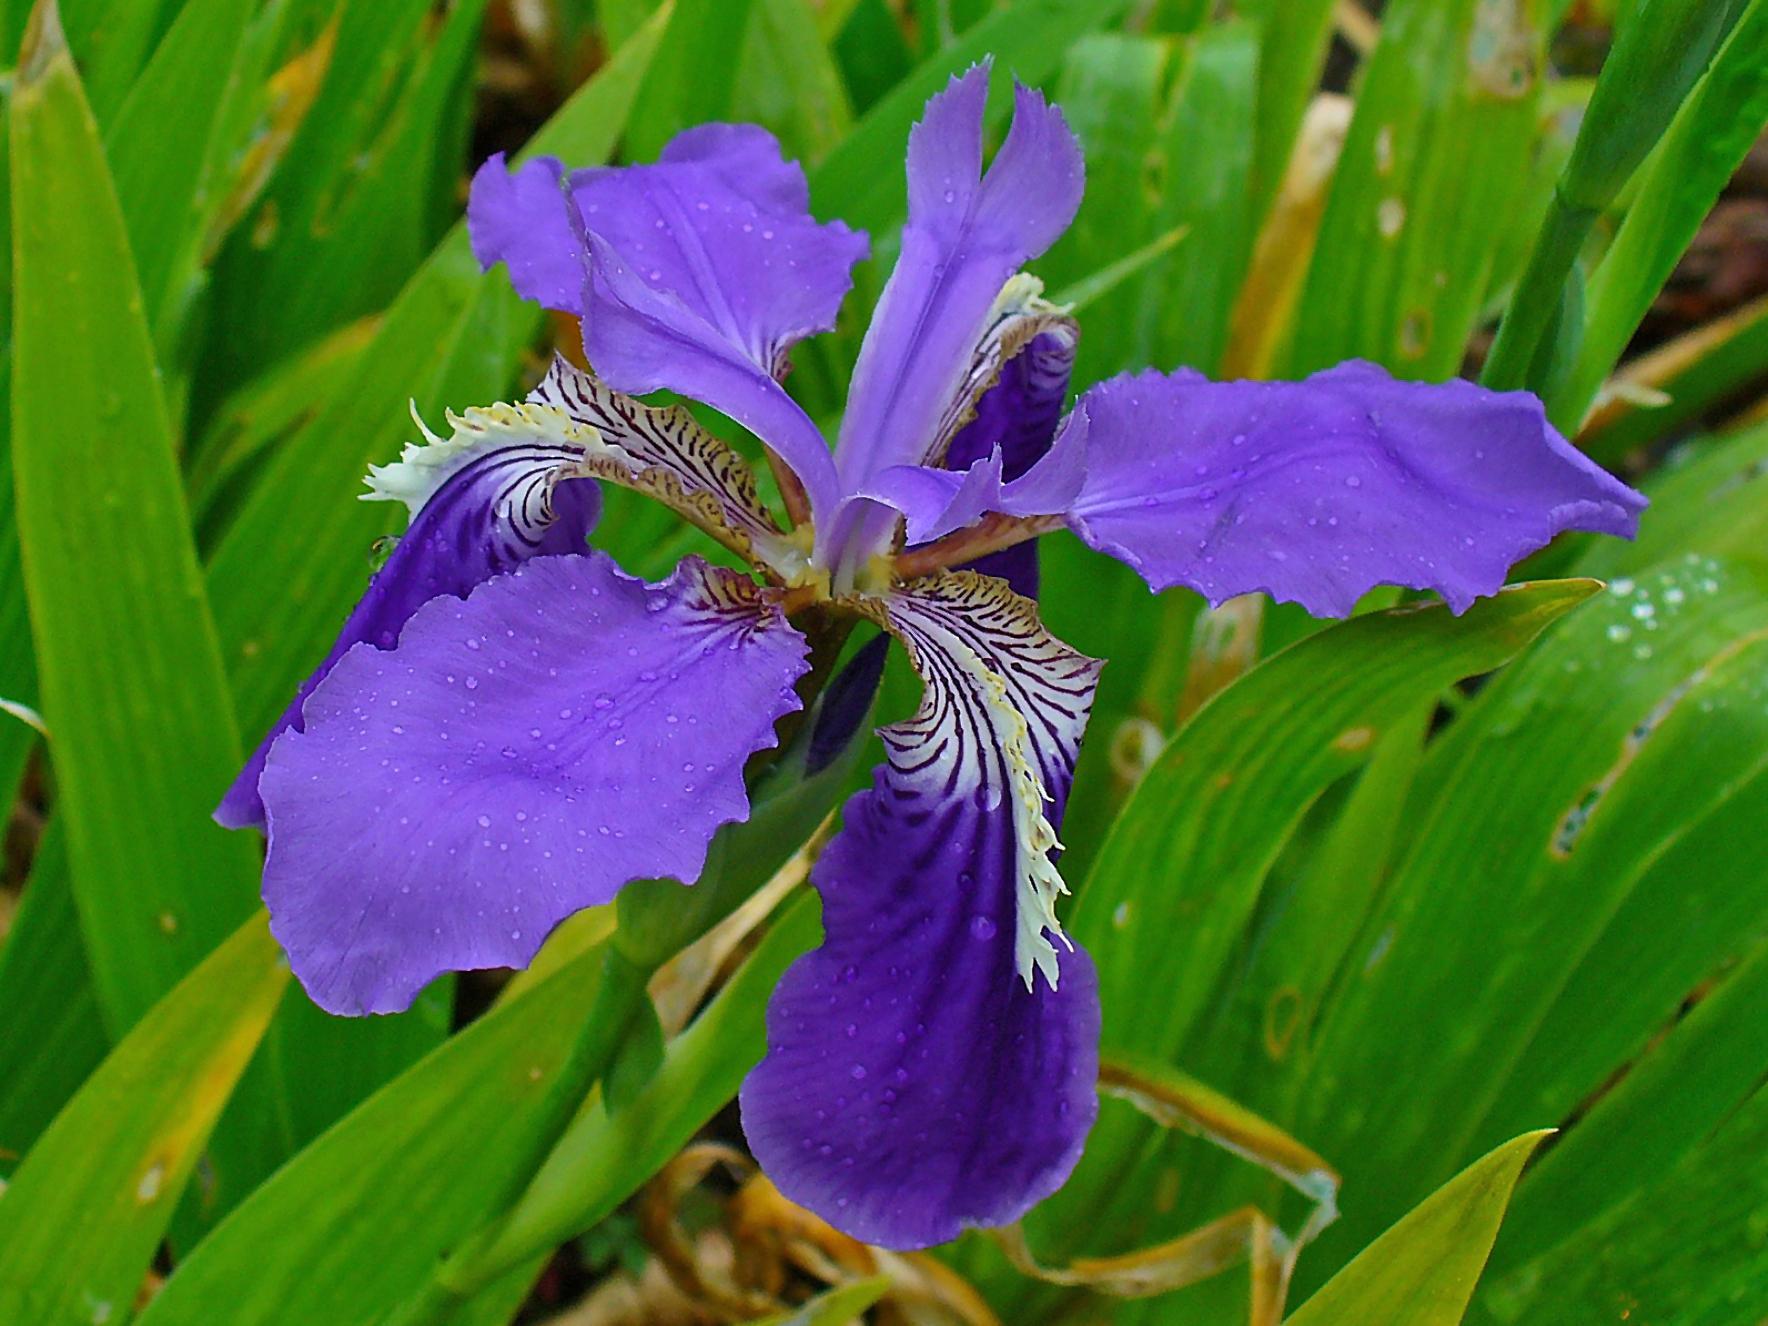 File:Iris tectorum 002.JPG.